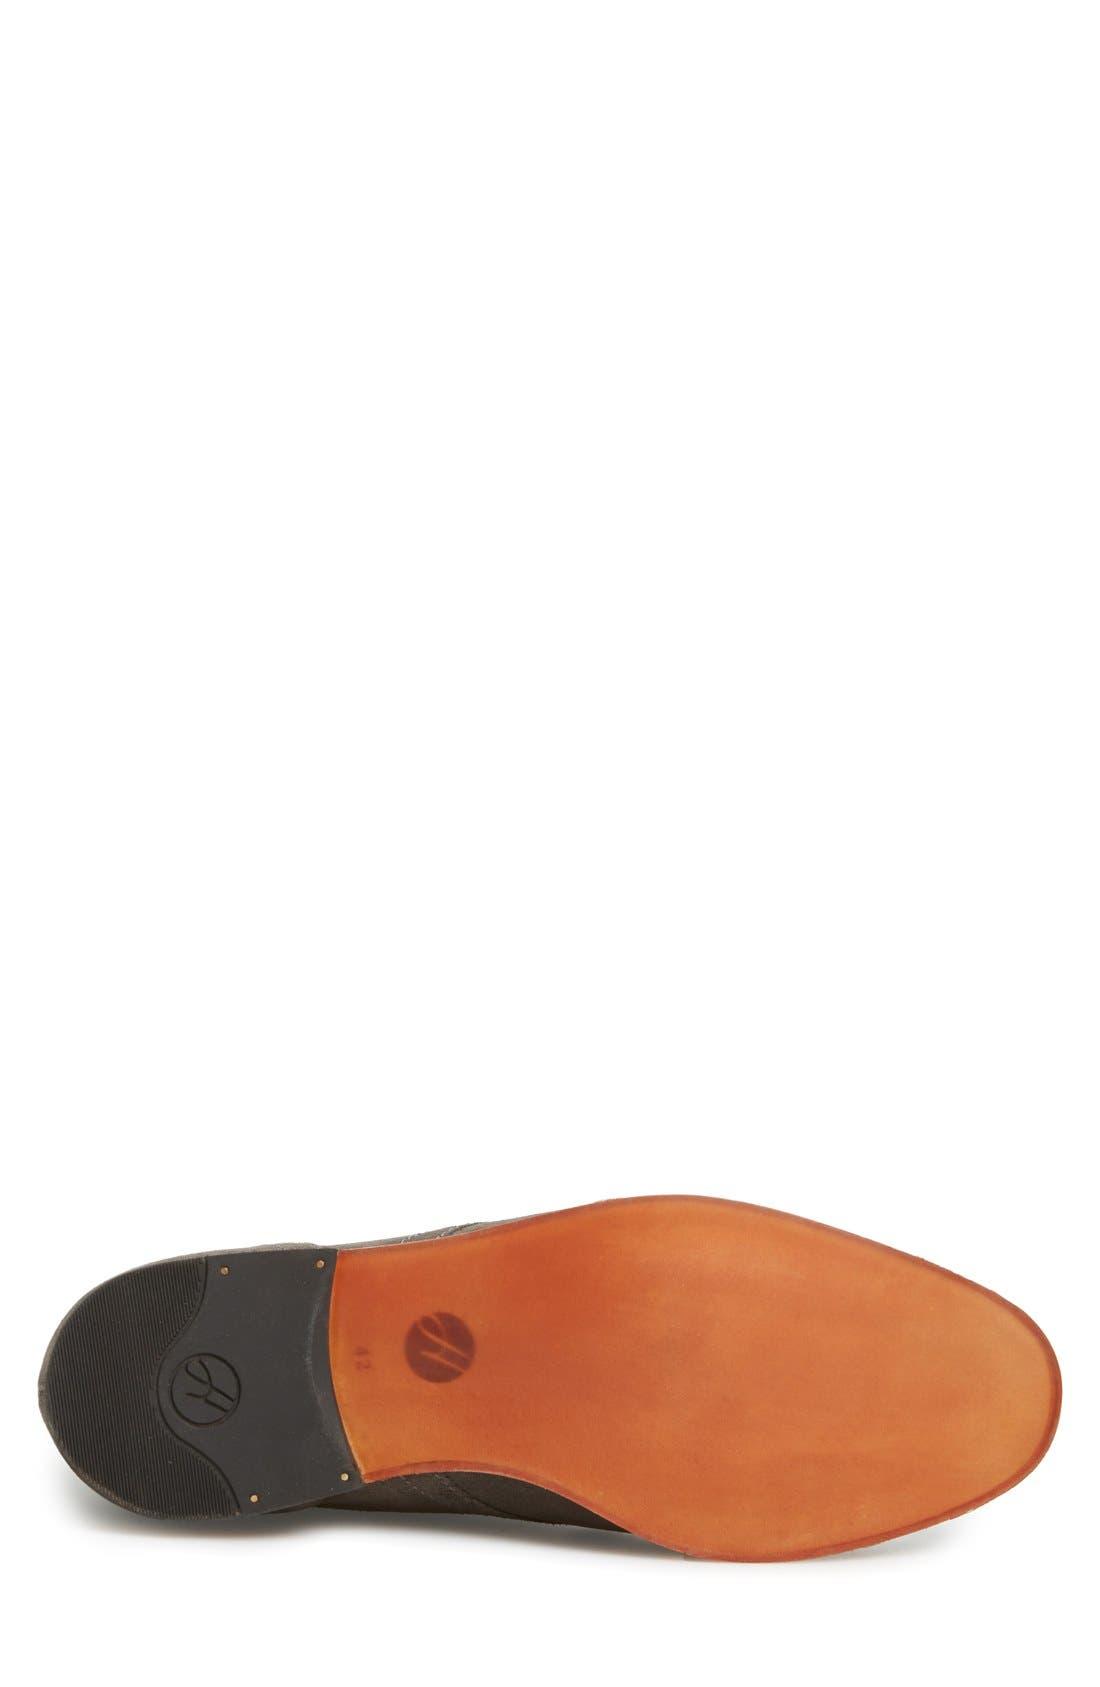 'Houghton 3' Suede Chukka Boot,                             Alternate thumbnail 3, color,                             055